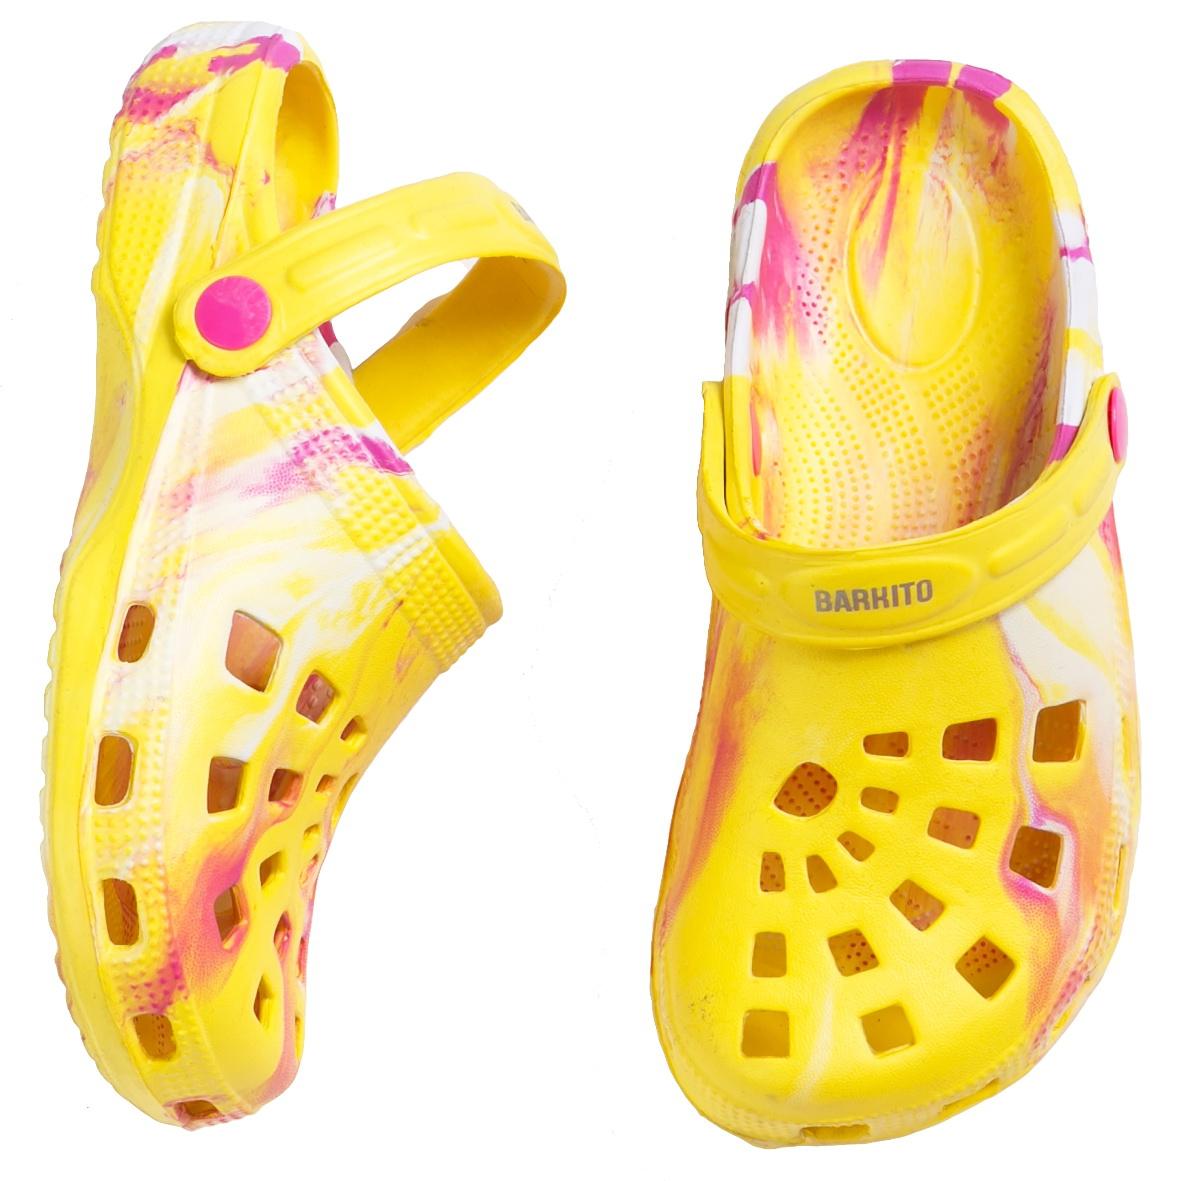 Сланцы (пляжная обувь) Barkito Сандалии для пляжа и бассейна для девочки Barkito желтый мода женщин сандалии flock party weddng обувь партии желтый цвет сандалии плюс размер a012 77